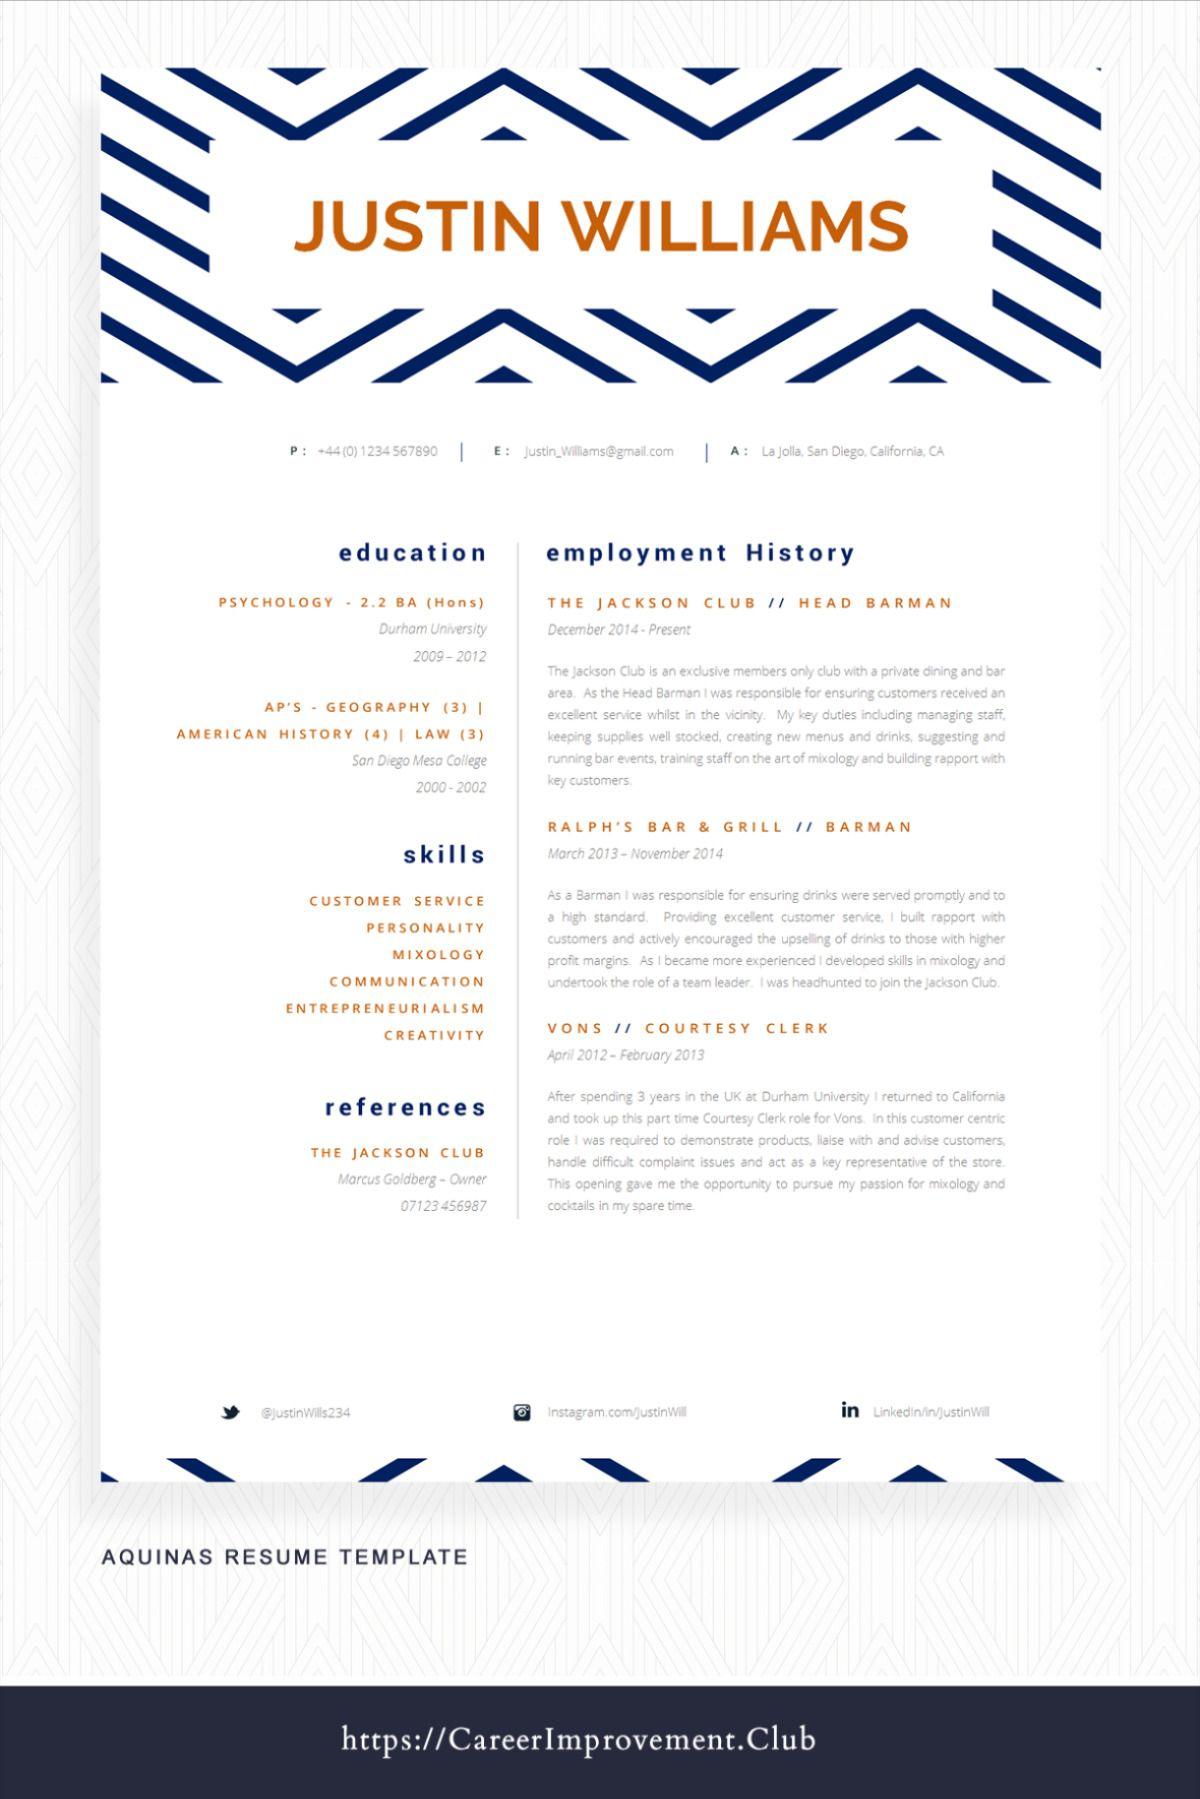 Hospitality resume example cv template creative cv